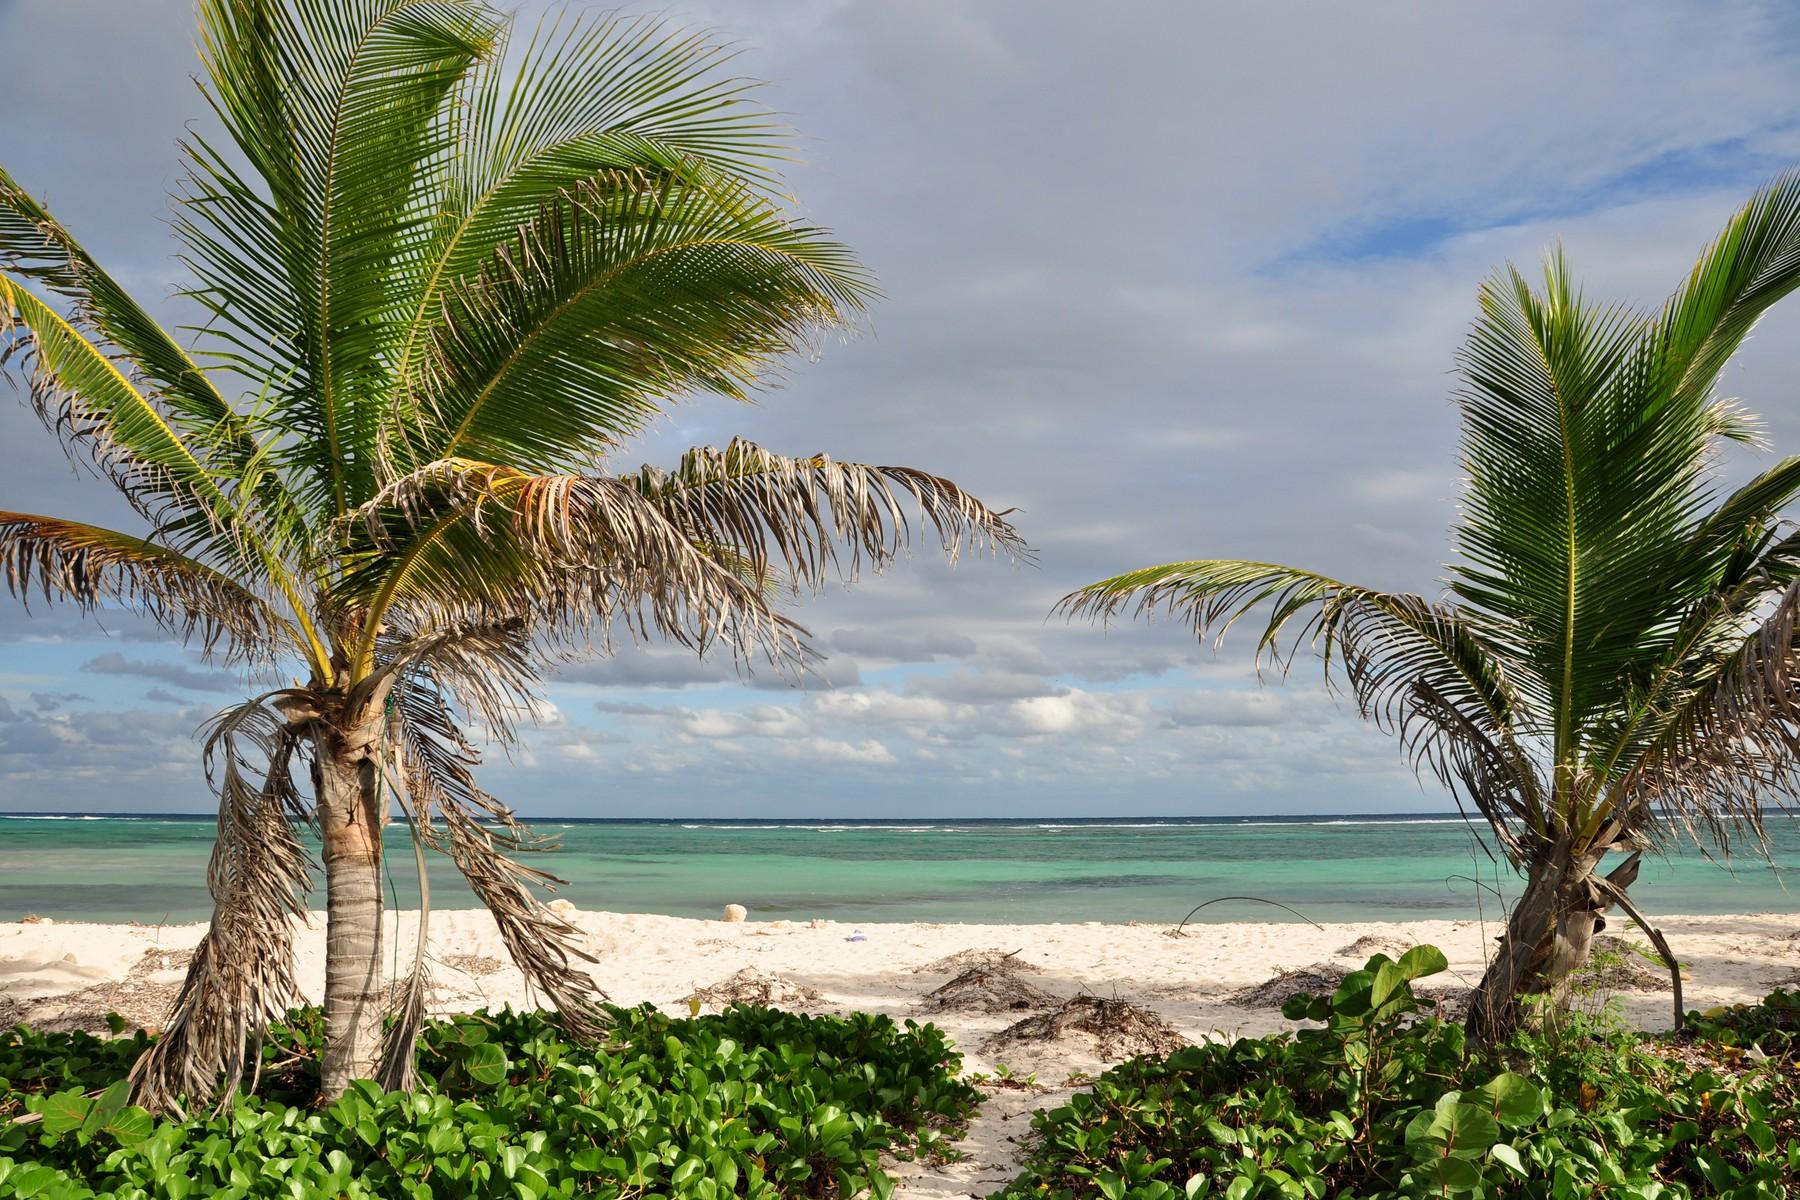 Additional photo for property listing at LOTE CON FRENTE DE PLAYA EN MAJAHUAL Beachfront Majahual Lot Carretera Cafetal-Majahual Majahual, Quintana Roo 77976 México